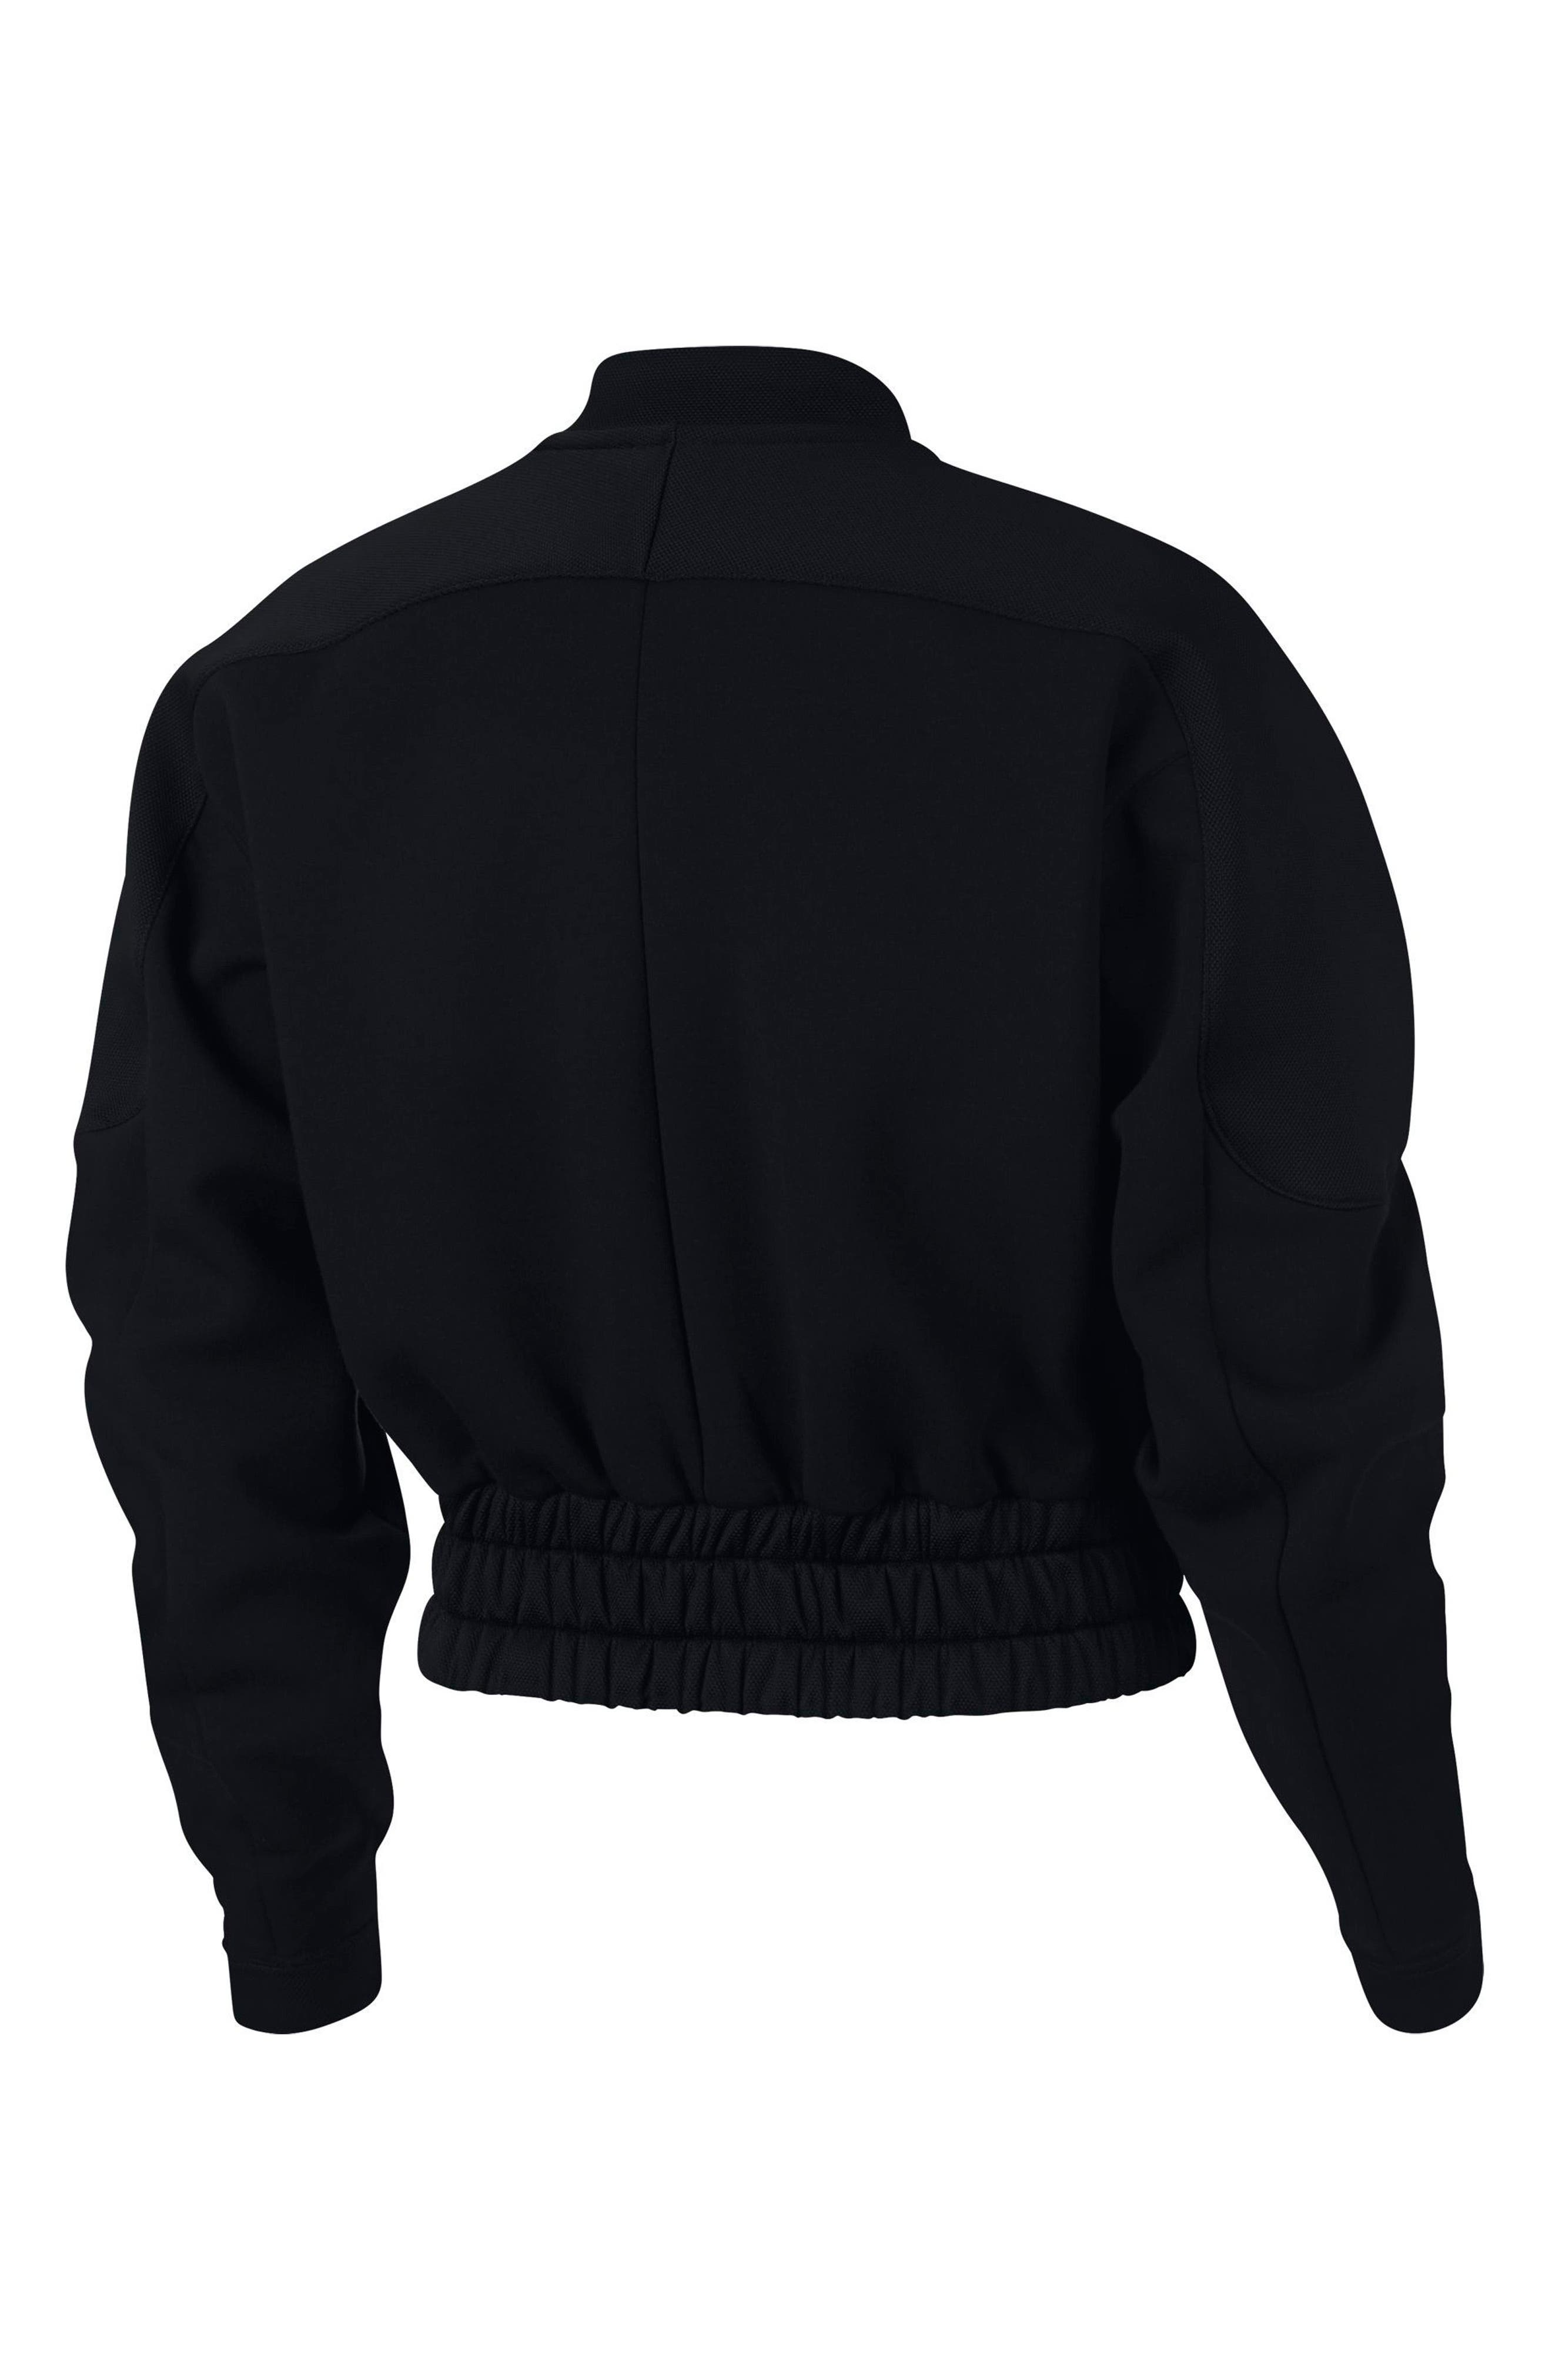 Dry Women's Bomber Jacket,                             Alternate thumbnail 2, color,                             BLACK/ BLACK